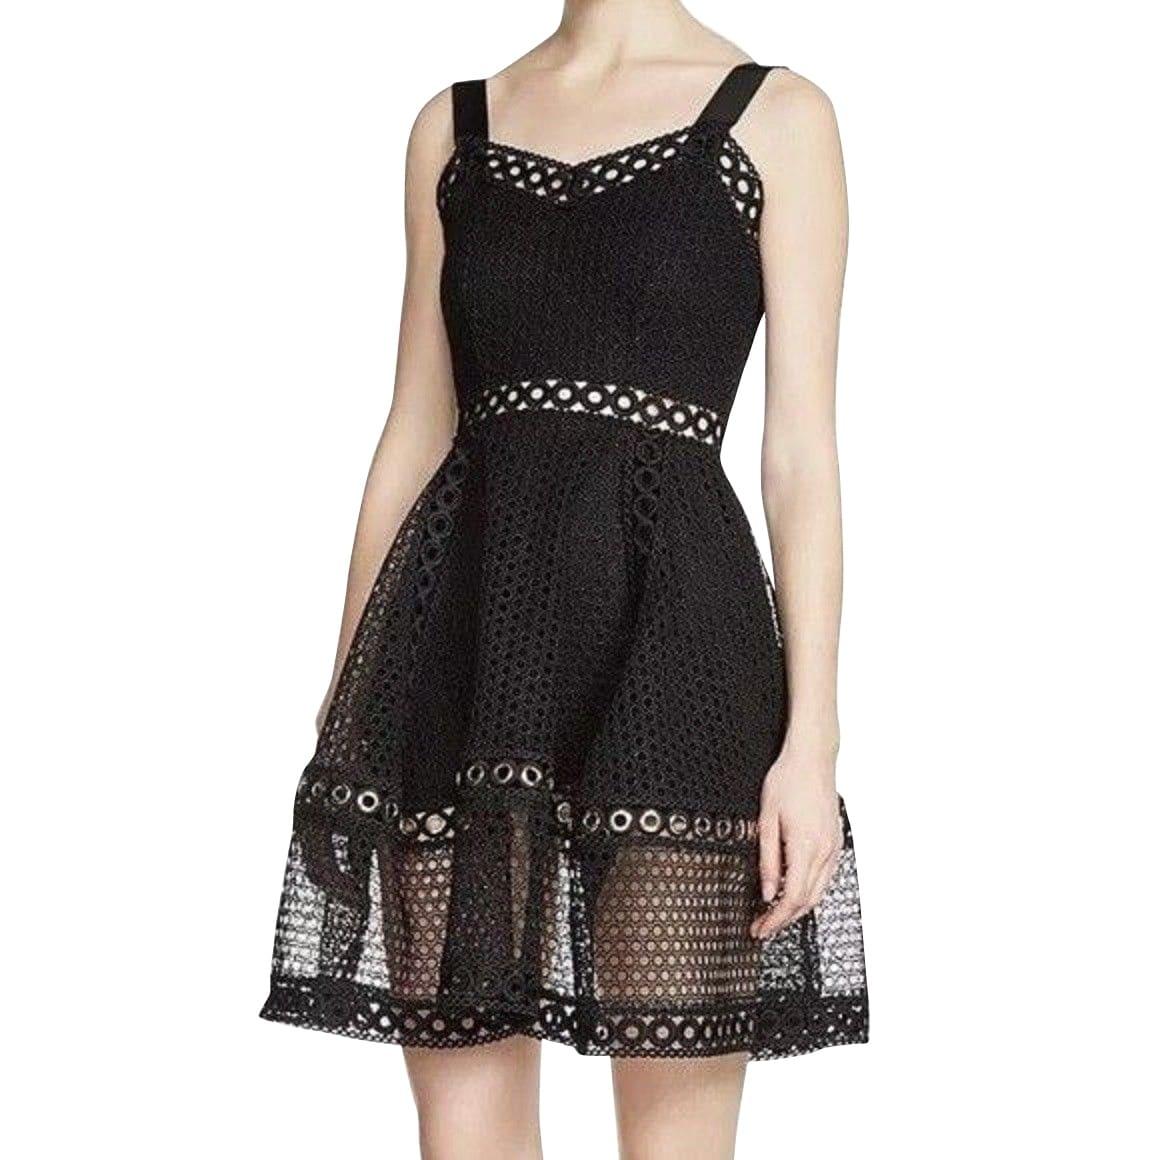 Maje Women S Fit Flare Black Polyester Lace Eyelet Trim Dress E17ravi 3 3 Overstock 30381068